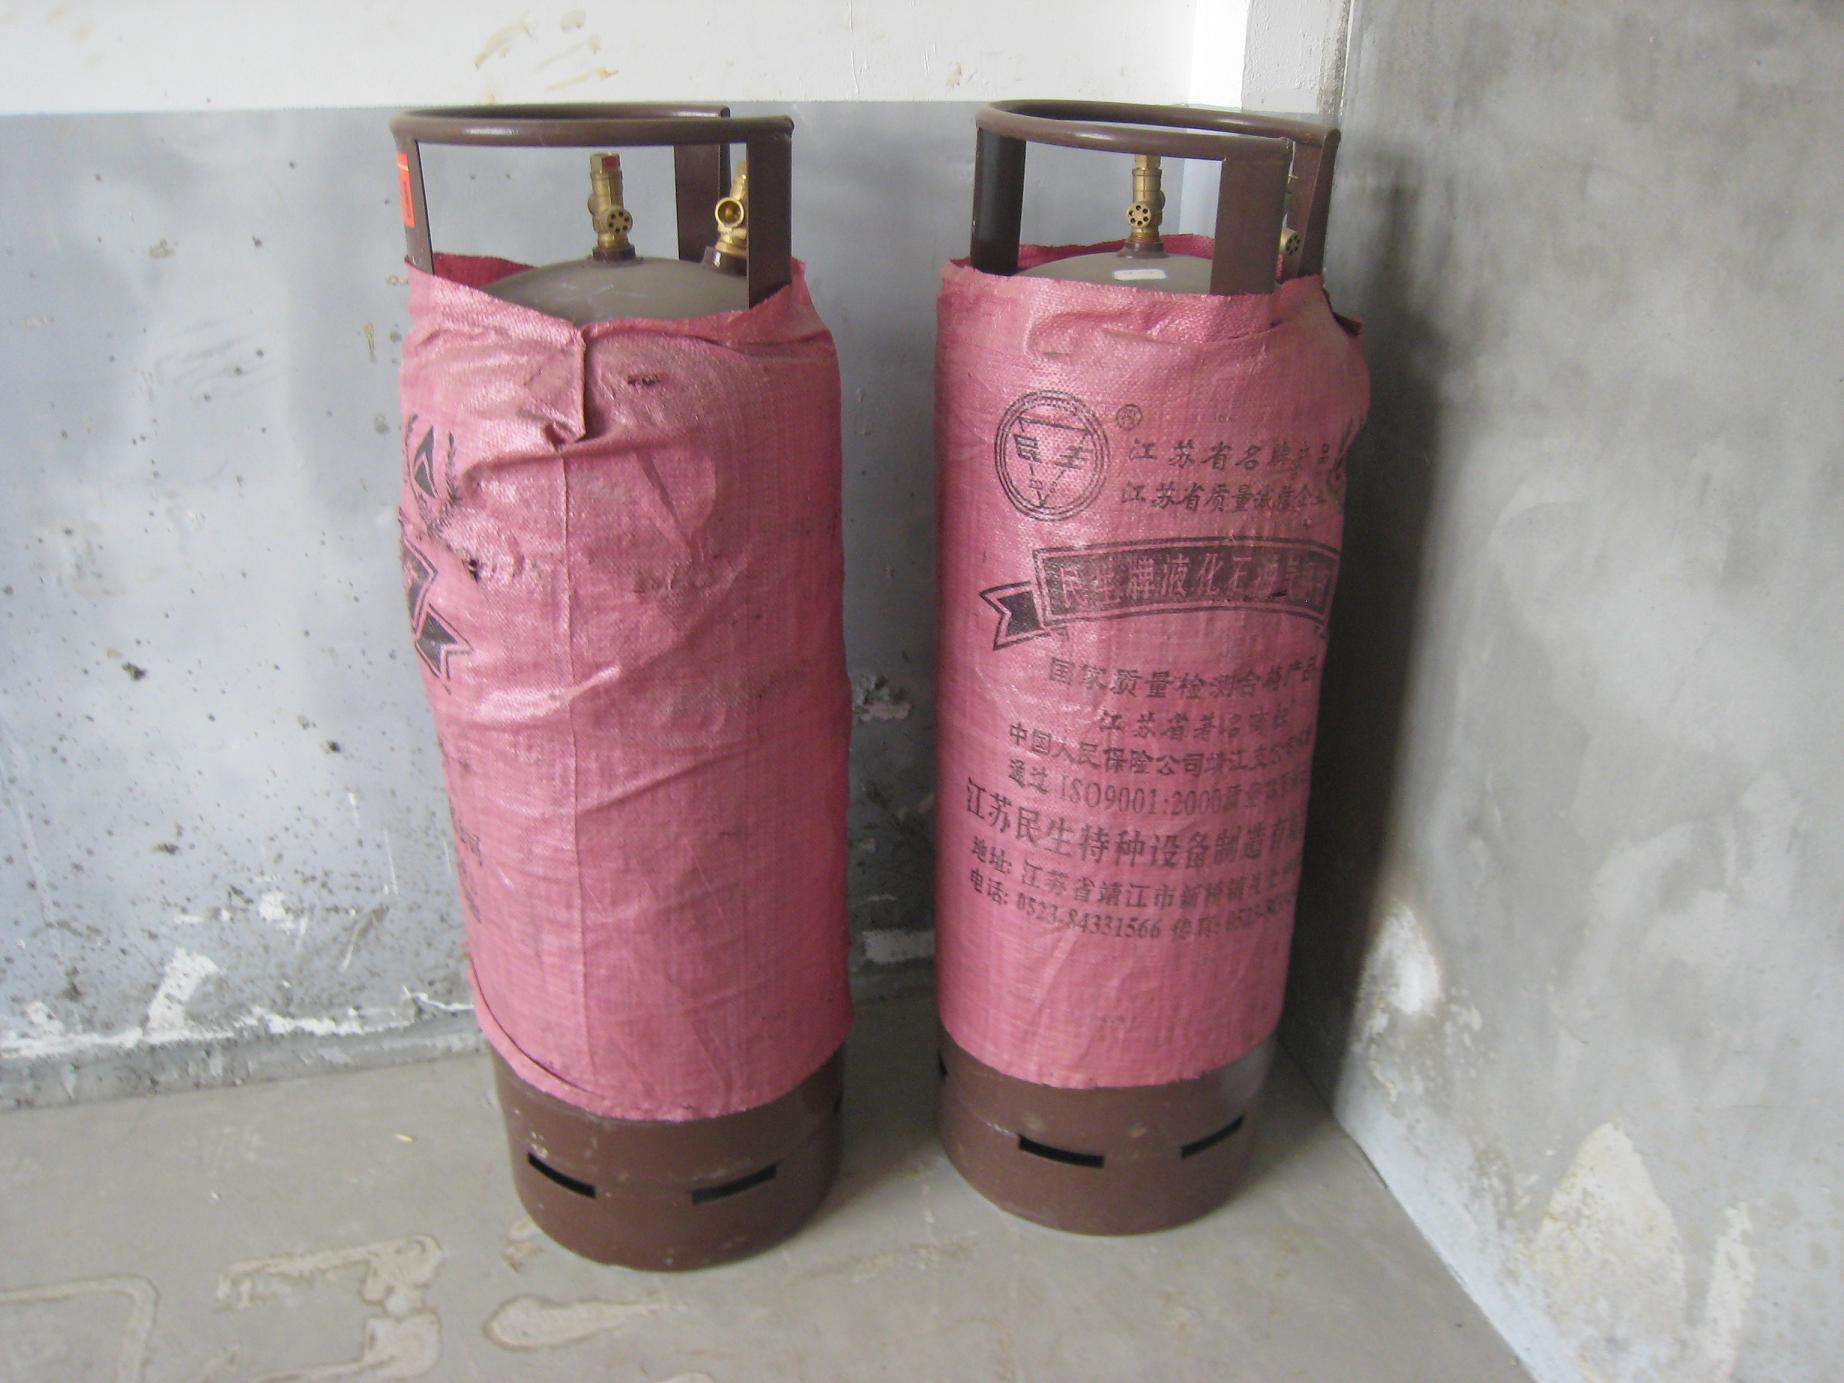 1,1-Dichloro-2,2-difluoroethene